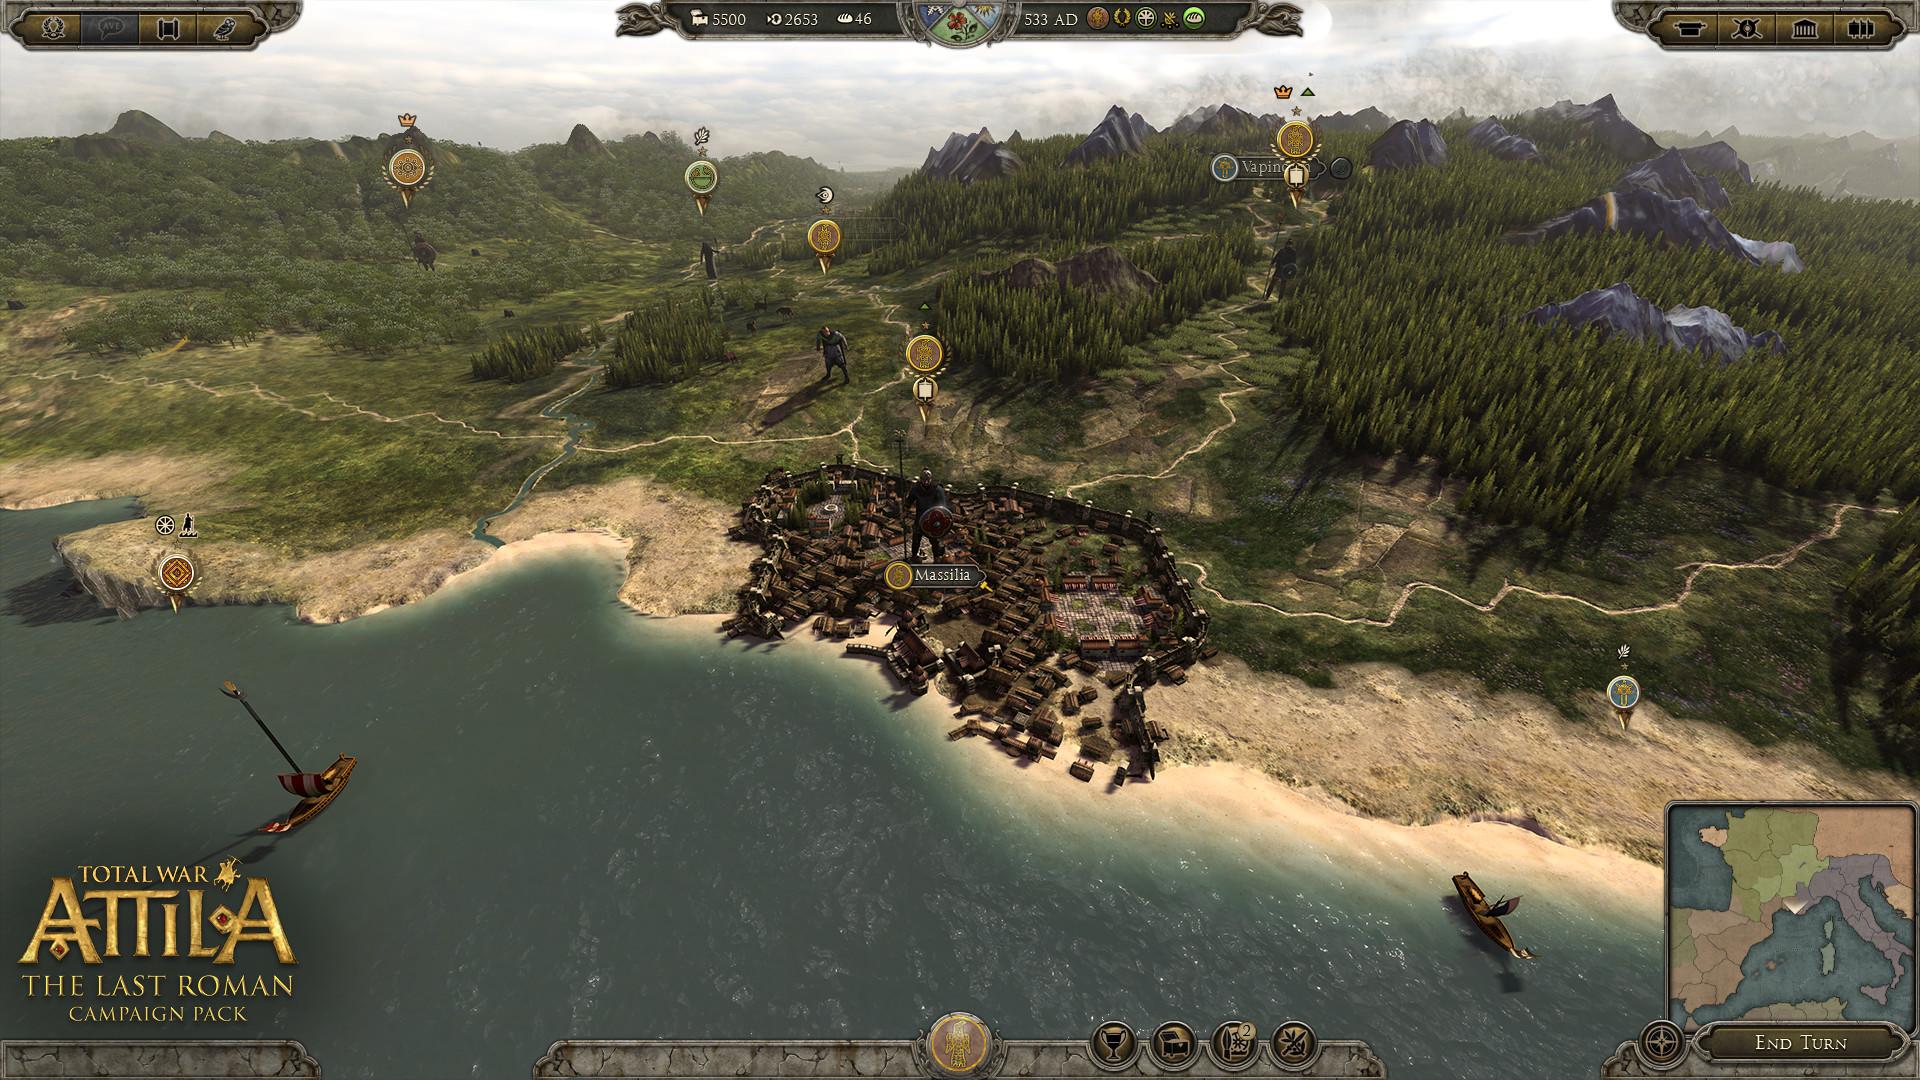 Total War: ATTILA - The Last Roman Campaign Pack Fiyat Karşılaştırma